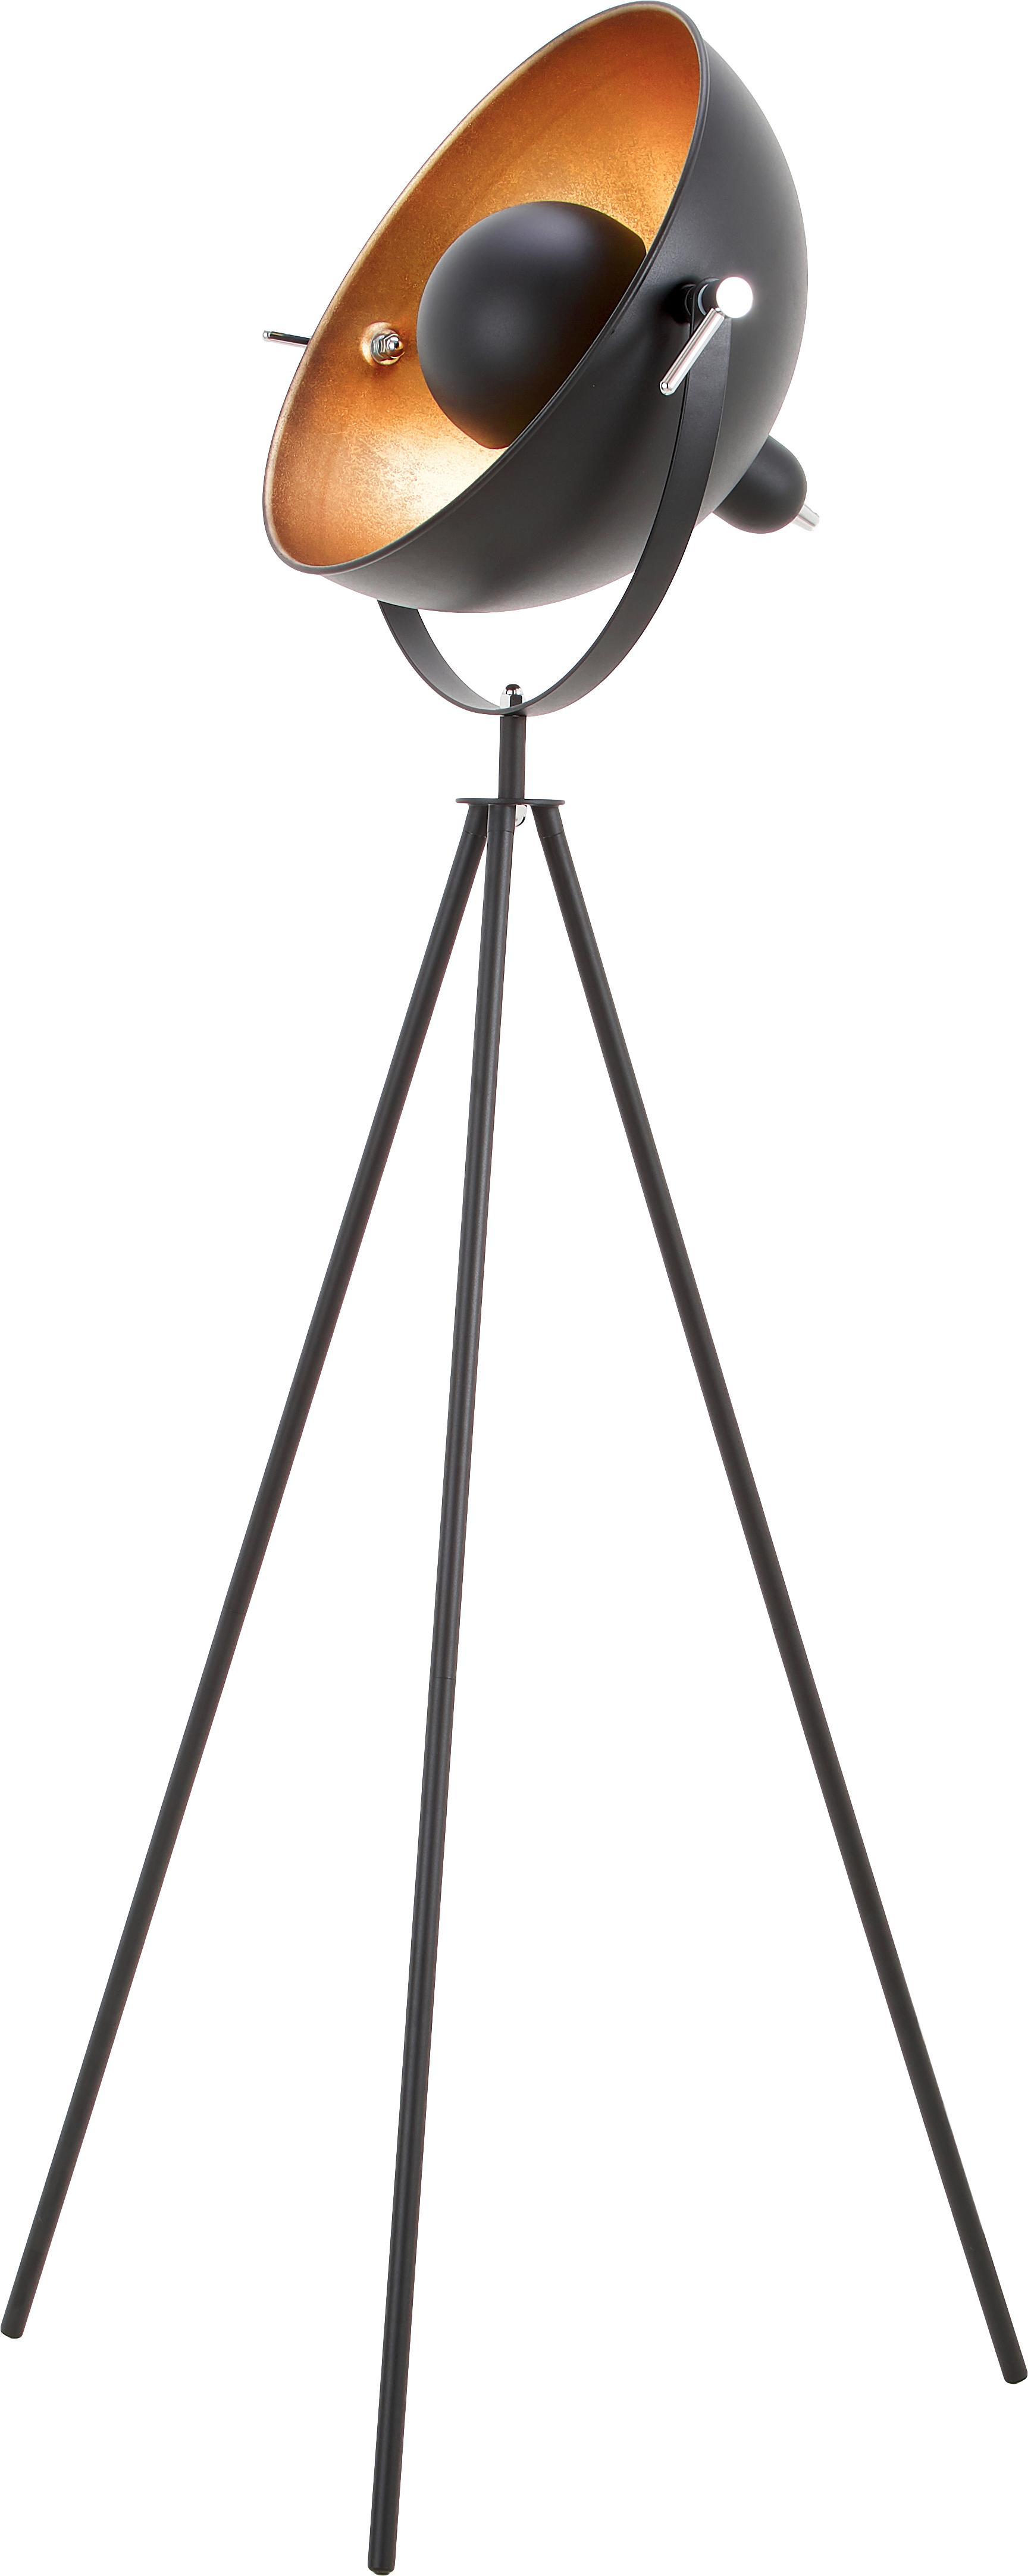 Lampada da terra industriale Captain, Nero, Ø 39 x Alt. 145 cm